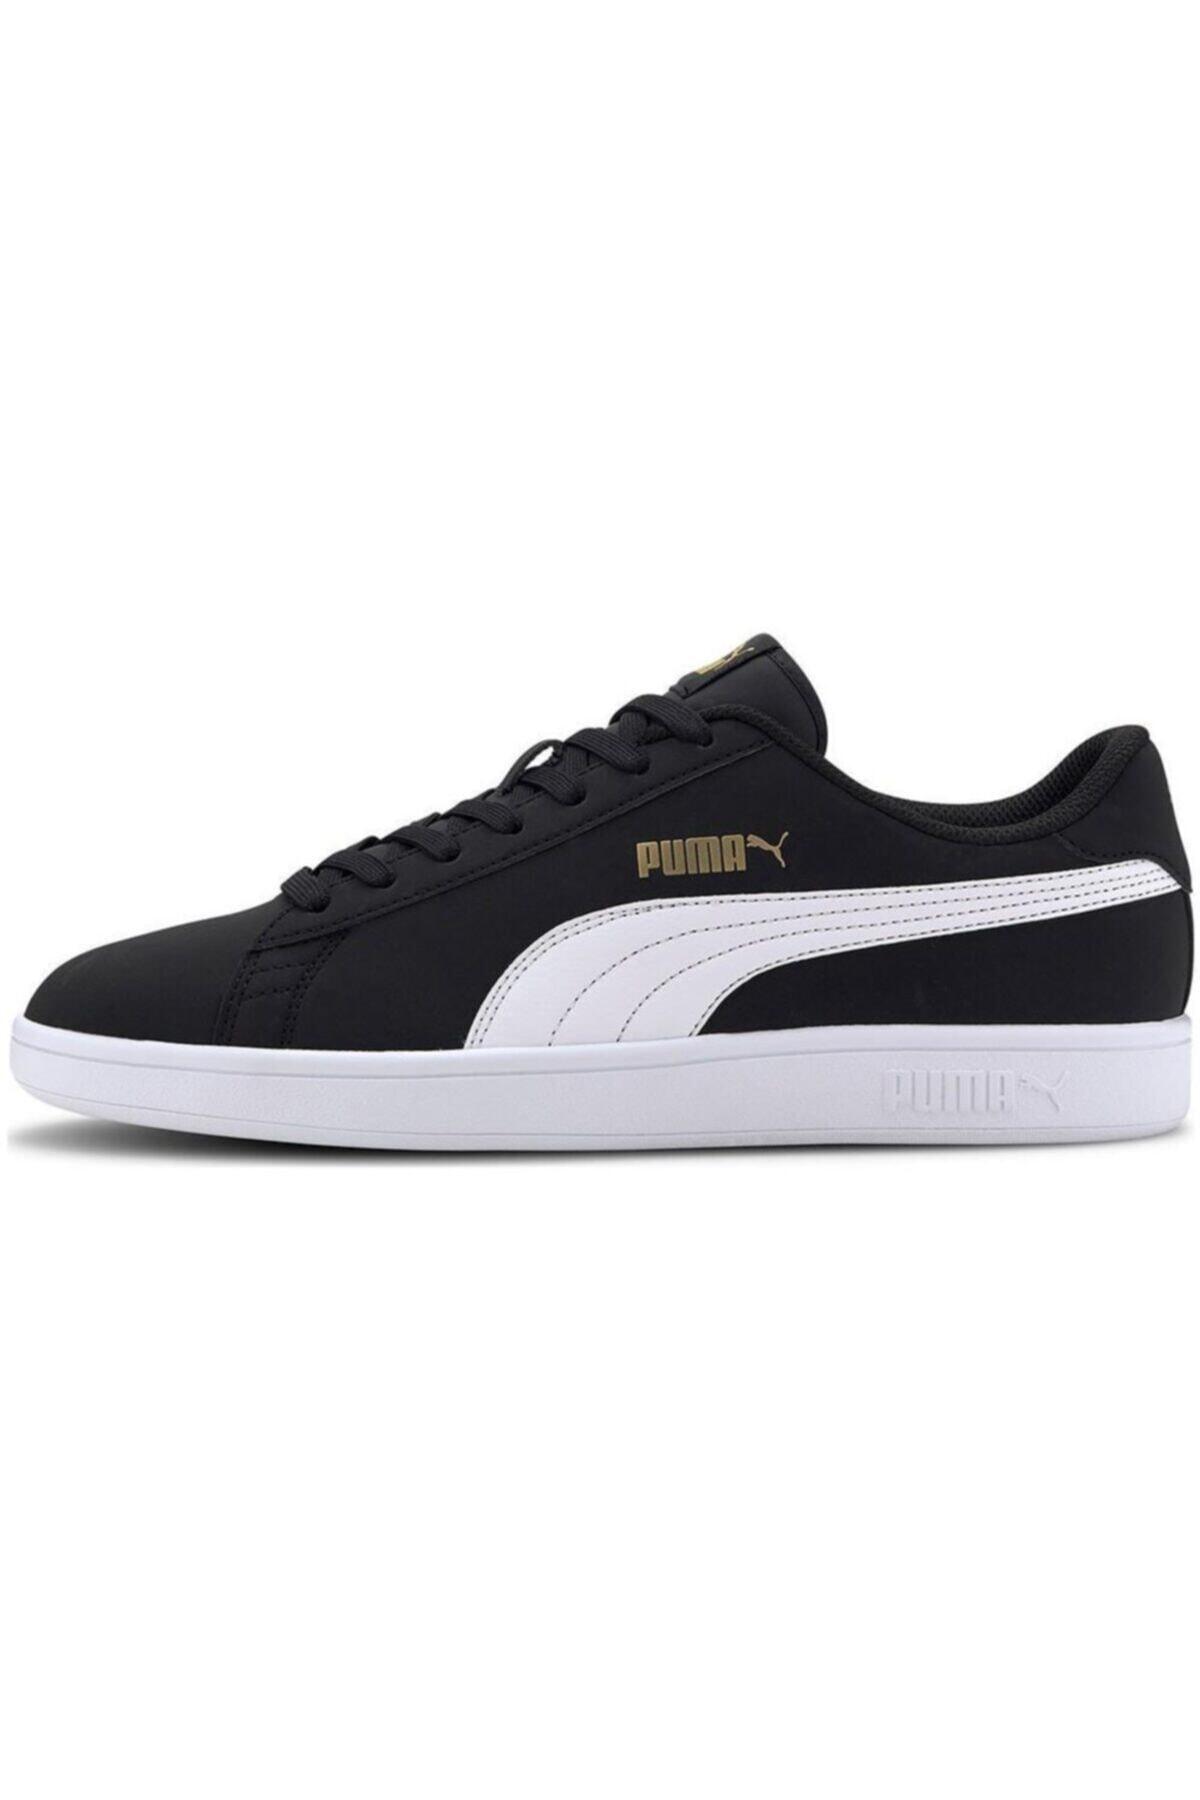 Puma SMASH V2 BUCK Siyah Erkek Sneaker Ayakkabı 100533097 1